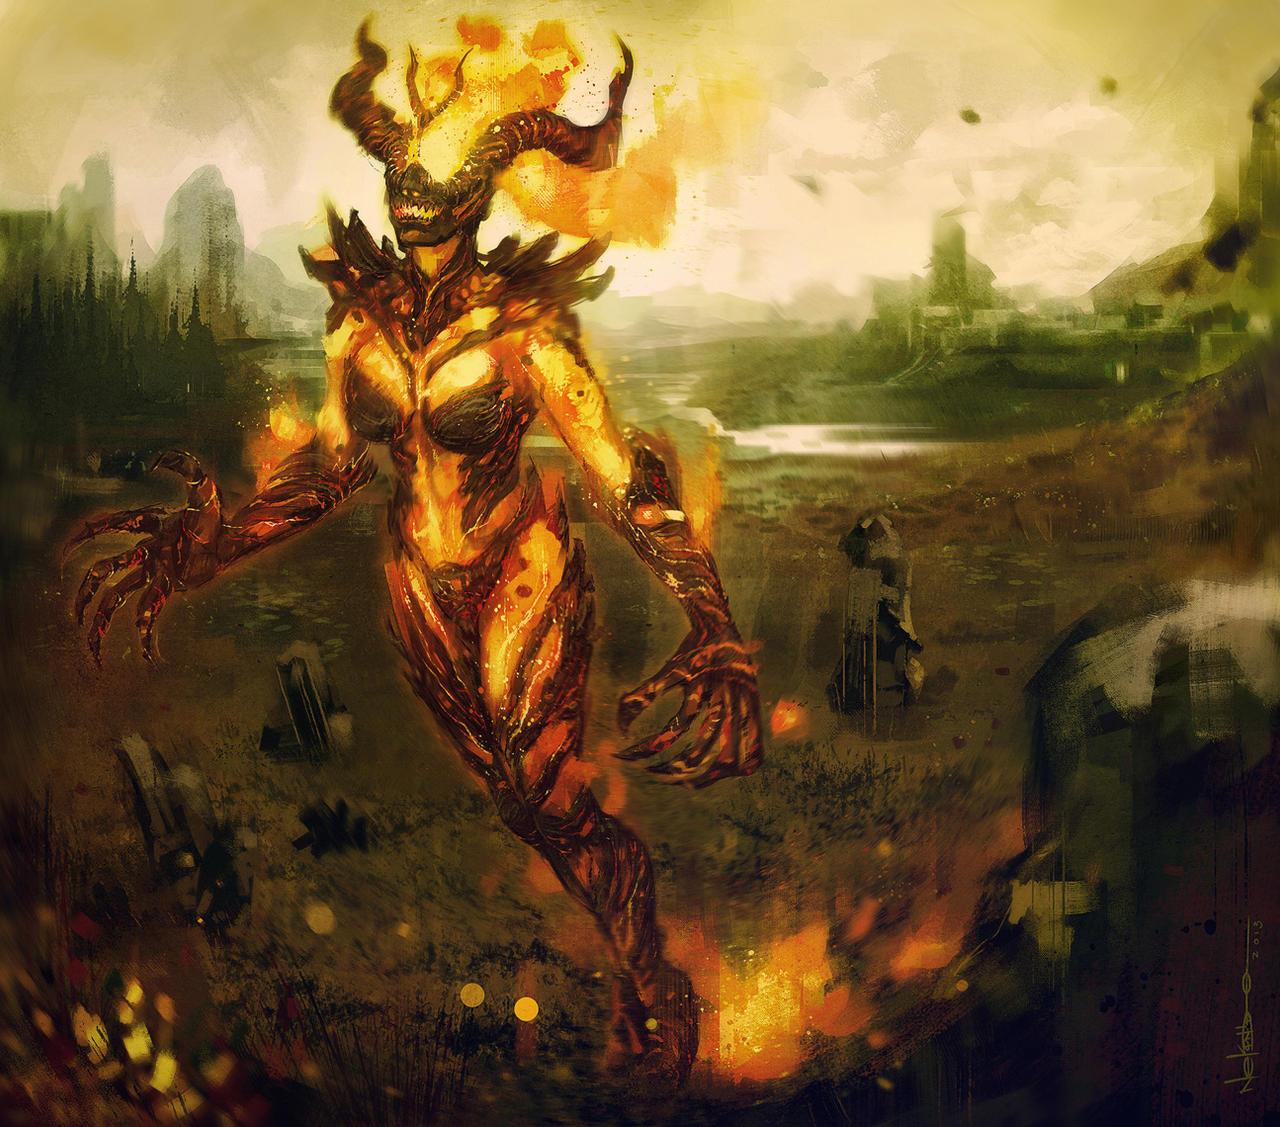 Flame Atronach by nelsoncosentino